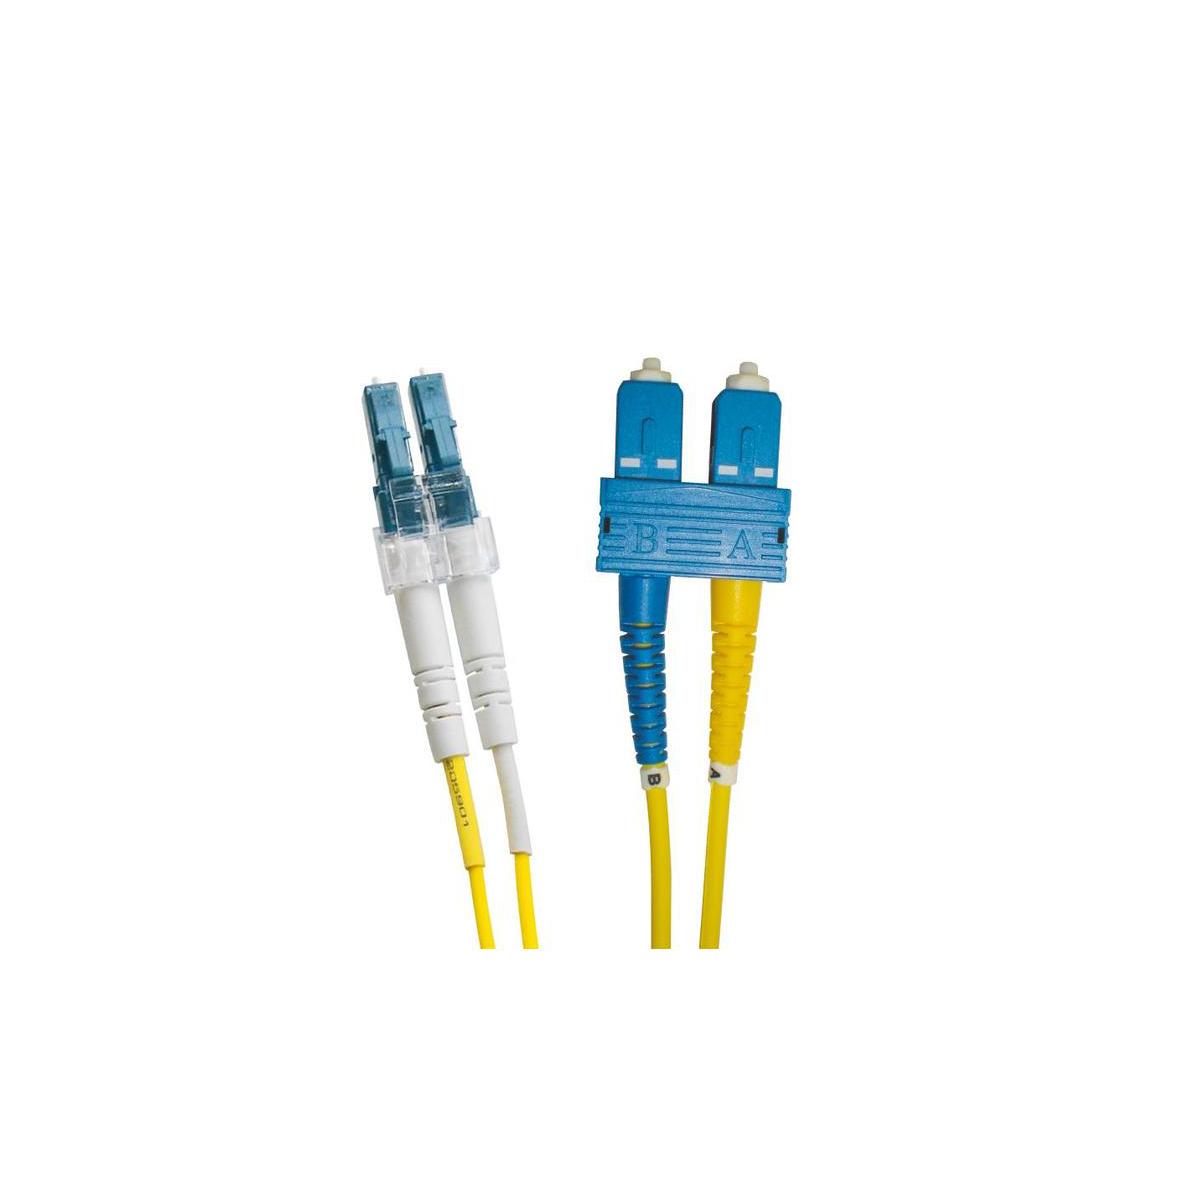 EXCEL OS2 10M LC-SC DUPLEX P/LEAD 9/125